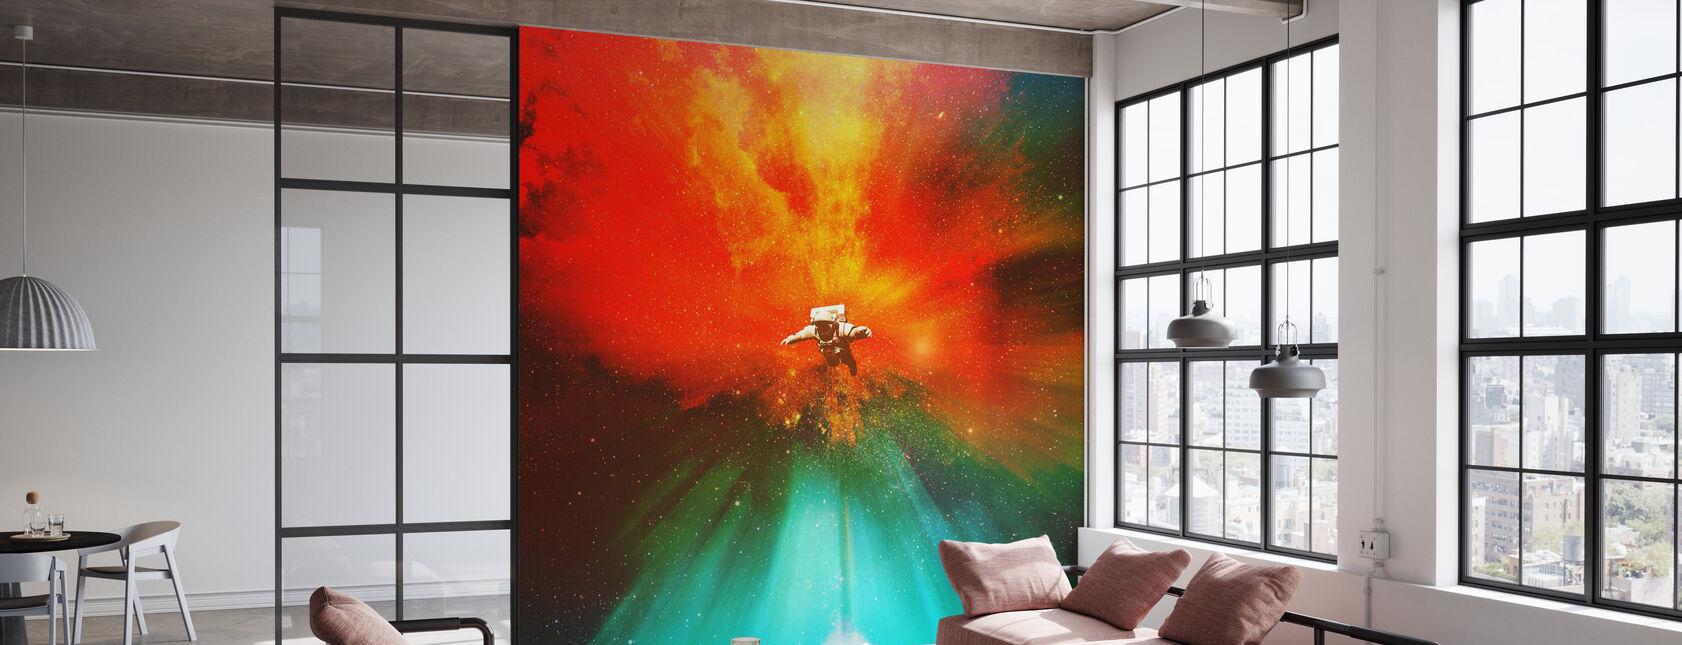 Stranded - Wallpaper - Office